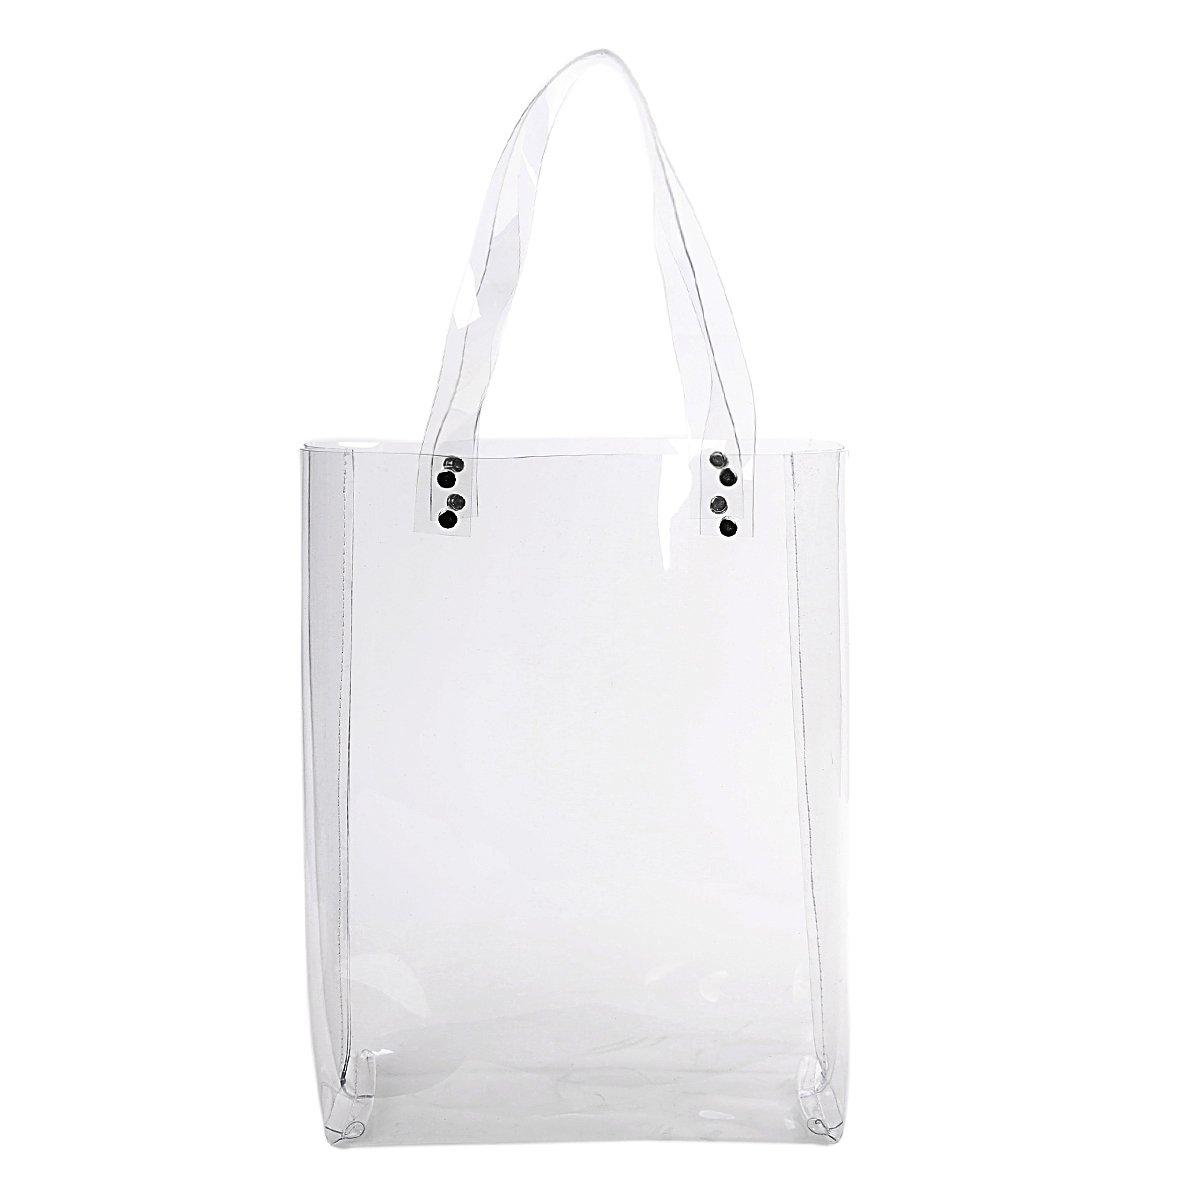 99da5881c604 Amazon.com  Zarapack Women s Clear Transparent Bag Large Tote PVC Bag  Shopping Bag  Shoes